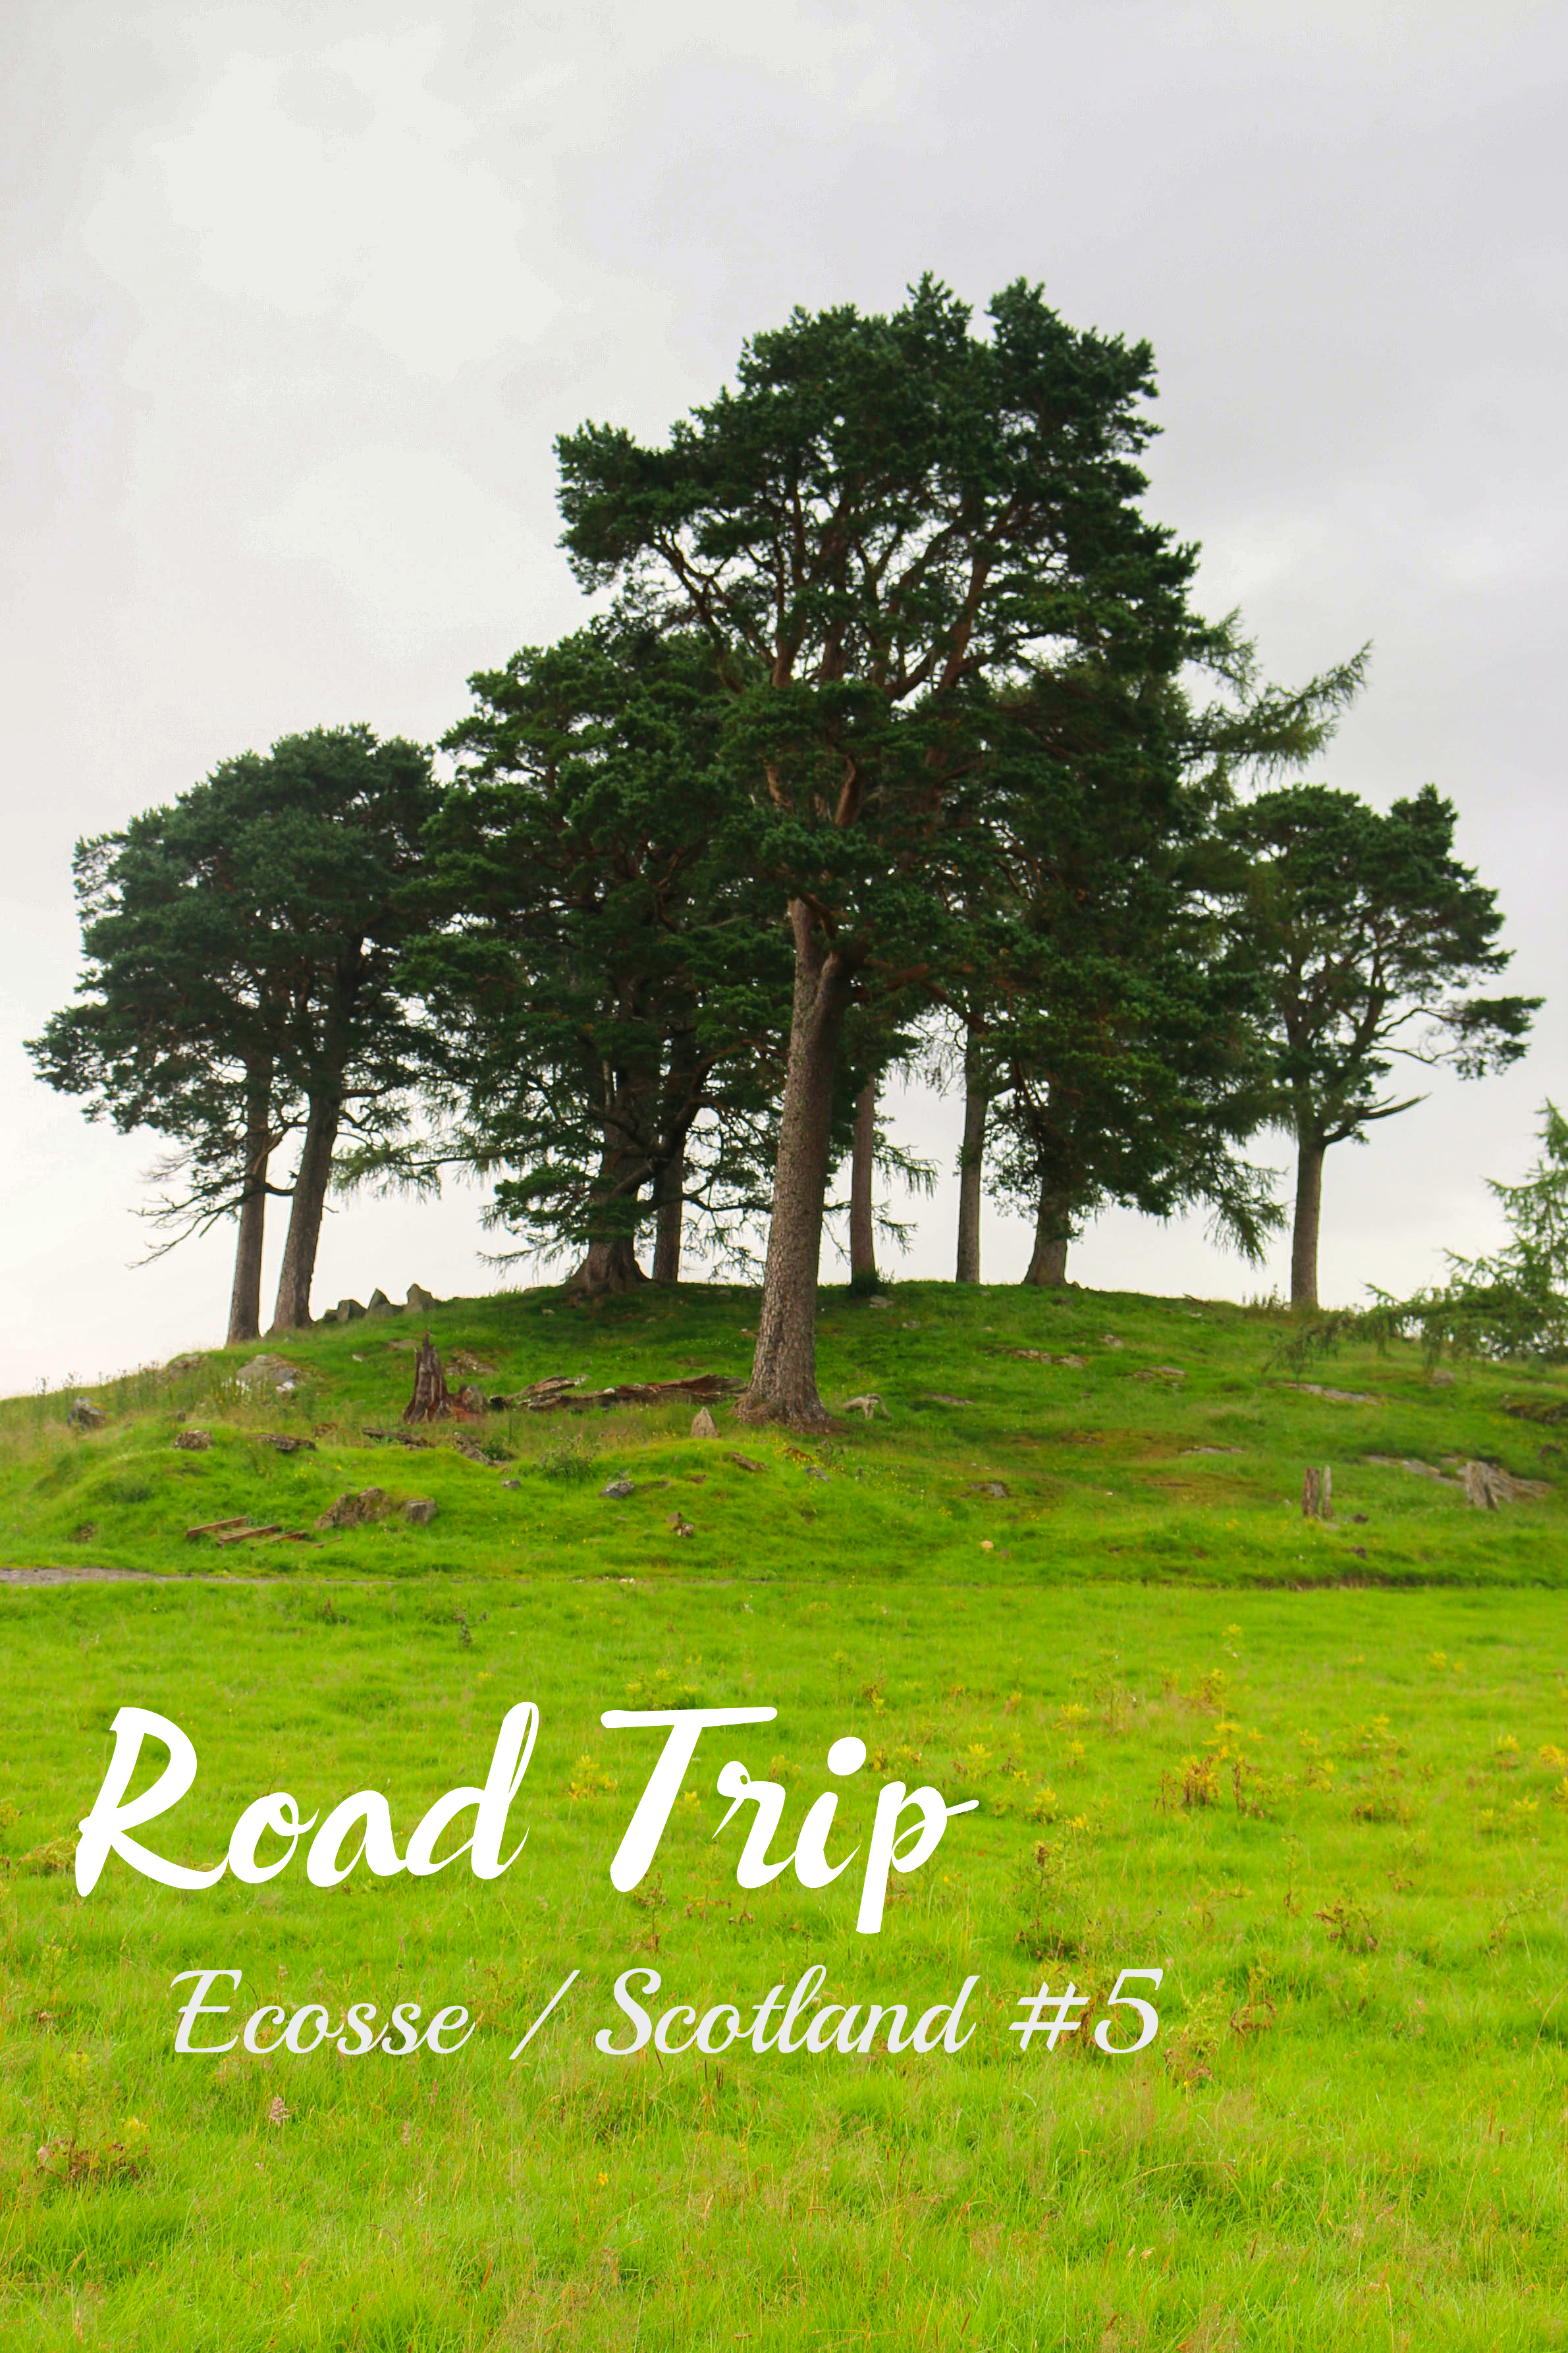 Craigh na dun- Outlander - road trip en Ecosse